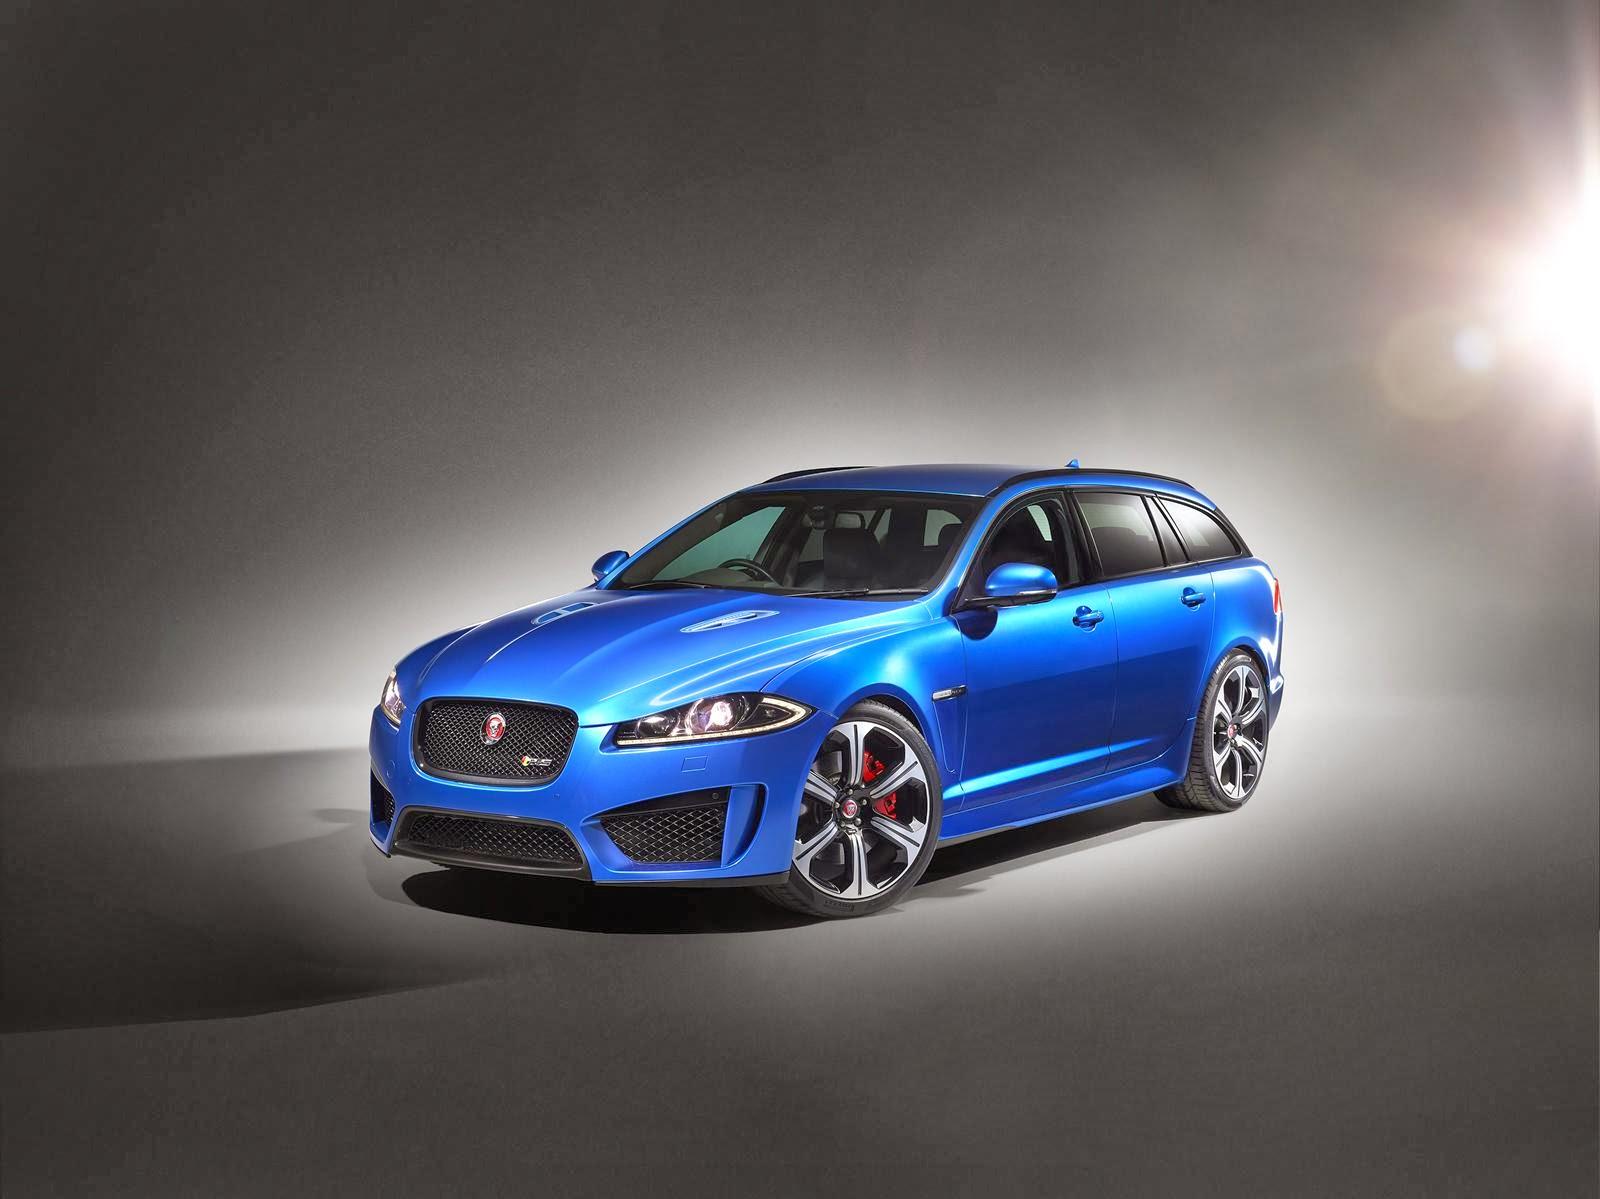 [Resim: Jaguar+XFR-S+Sportbrake+1.jpg]